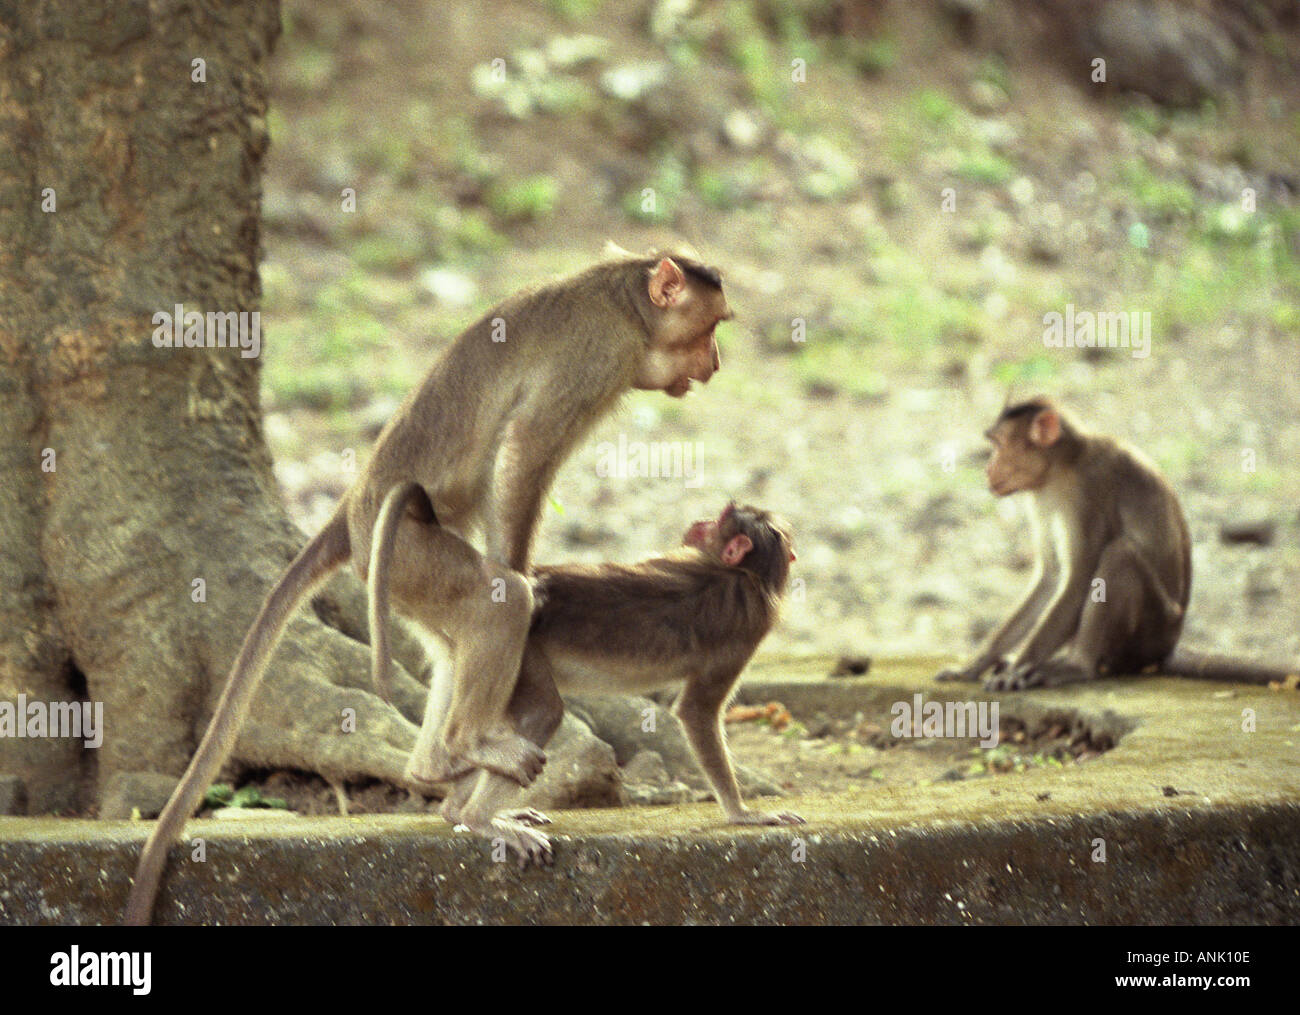 Monkys having sex